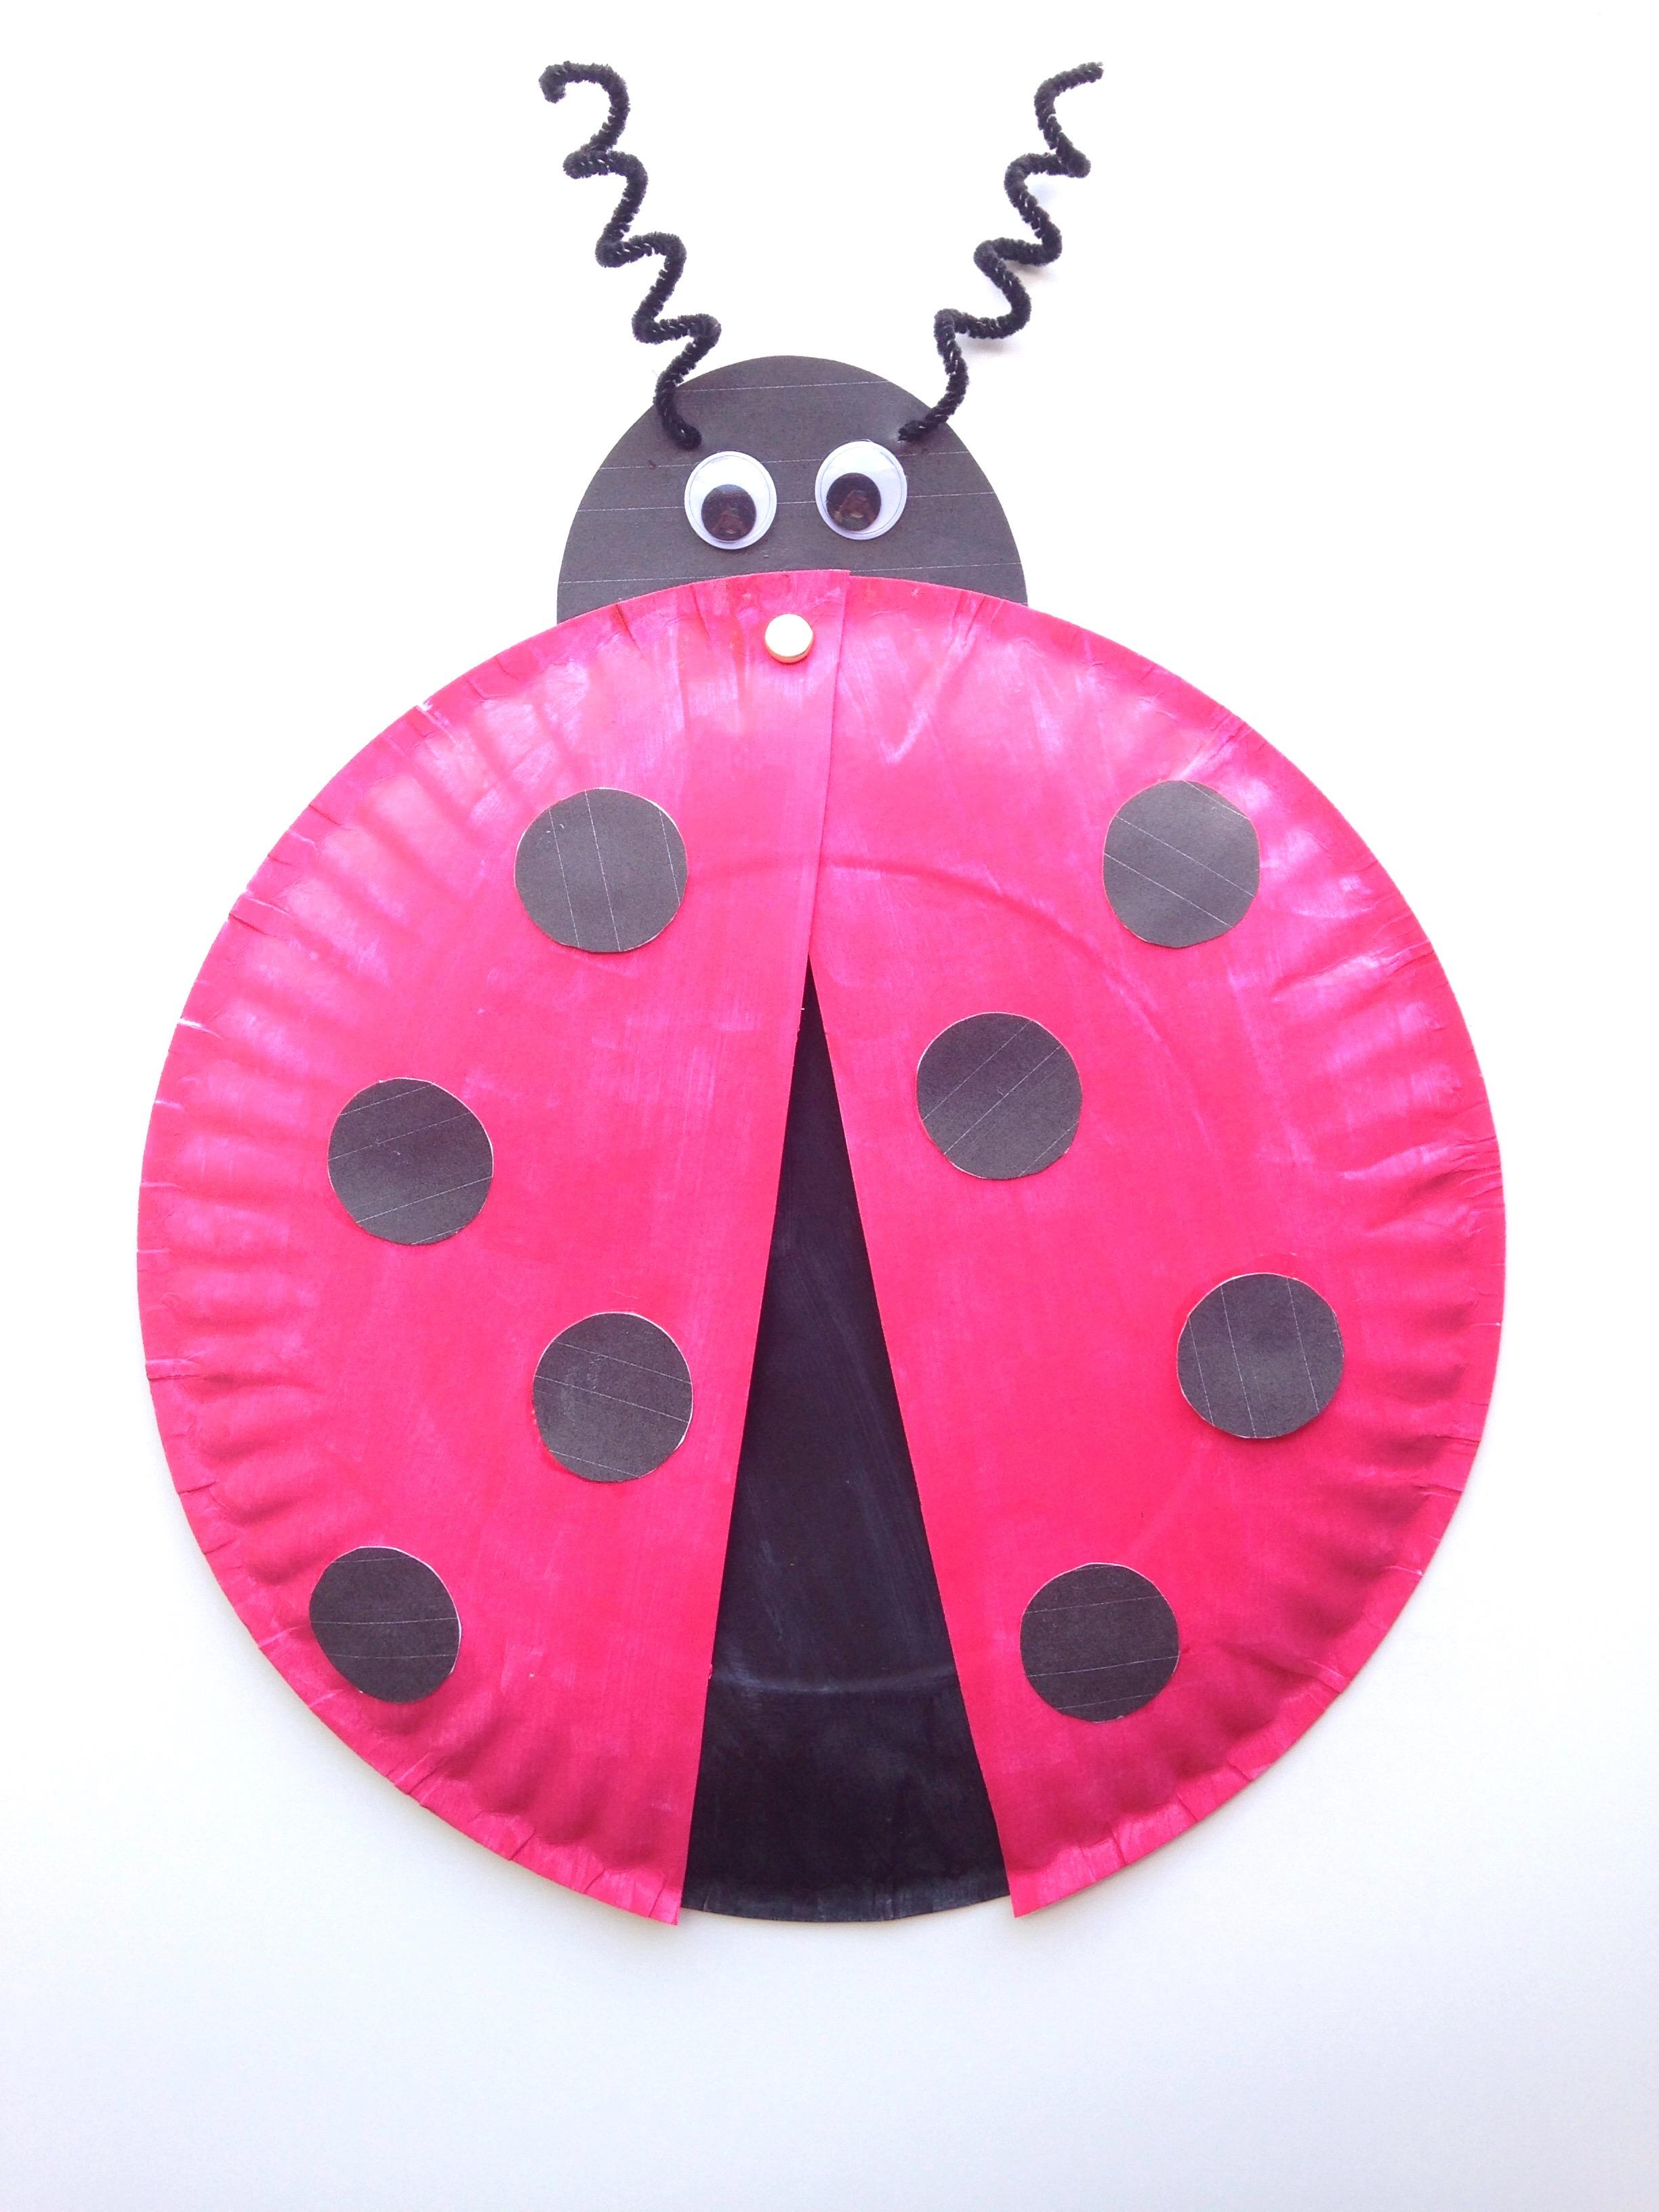 Ladybug Paper Plate Craft For Kids Free Printable Template 10